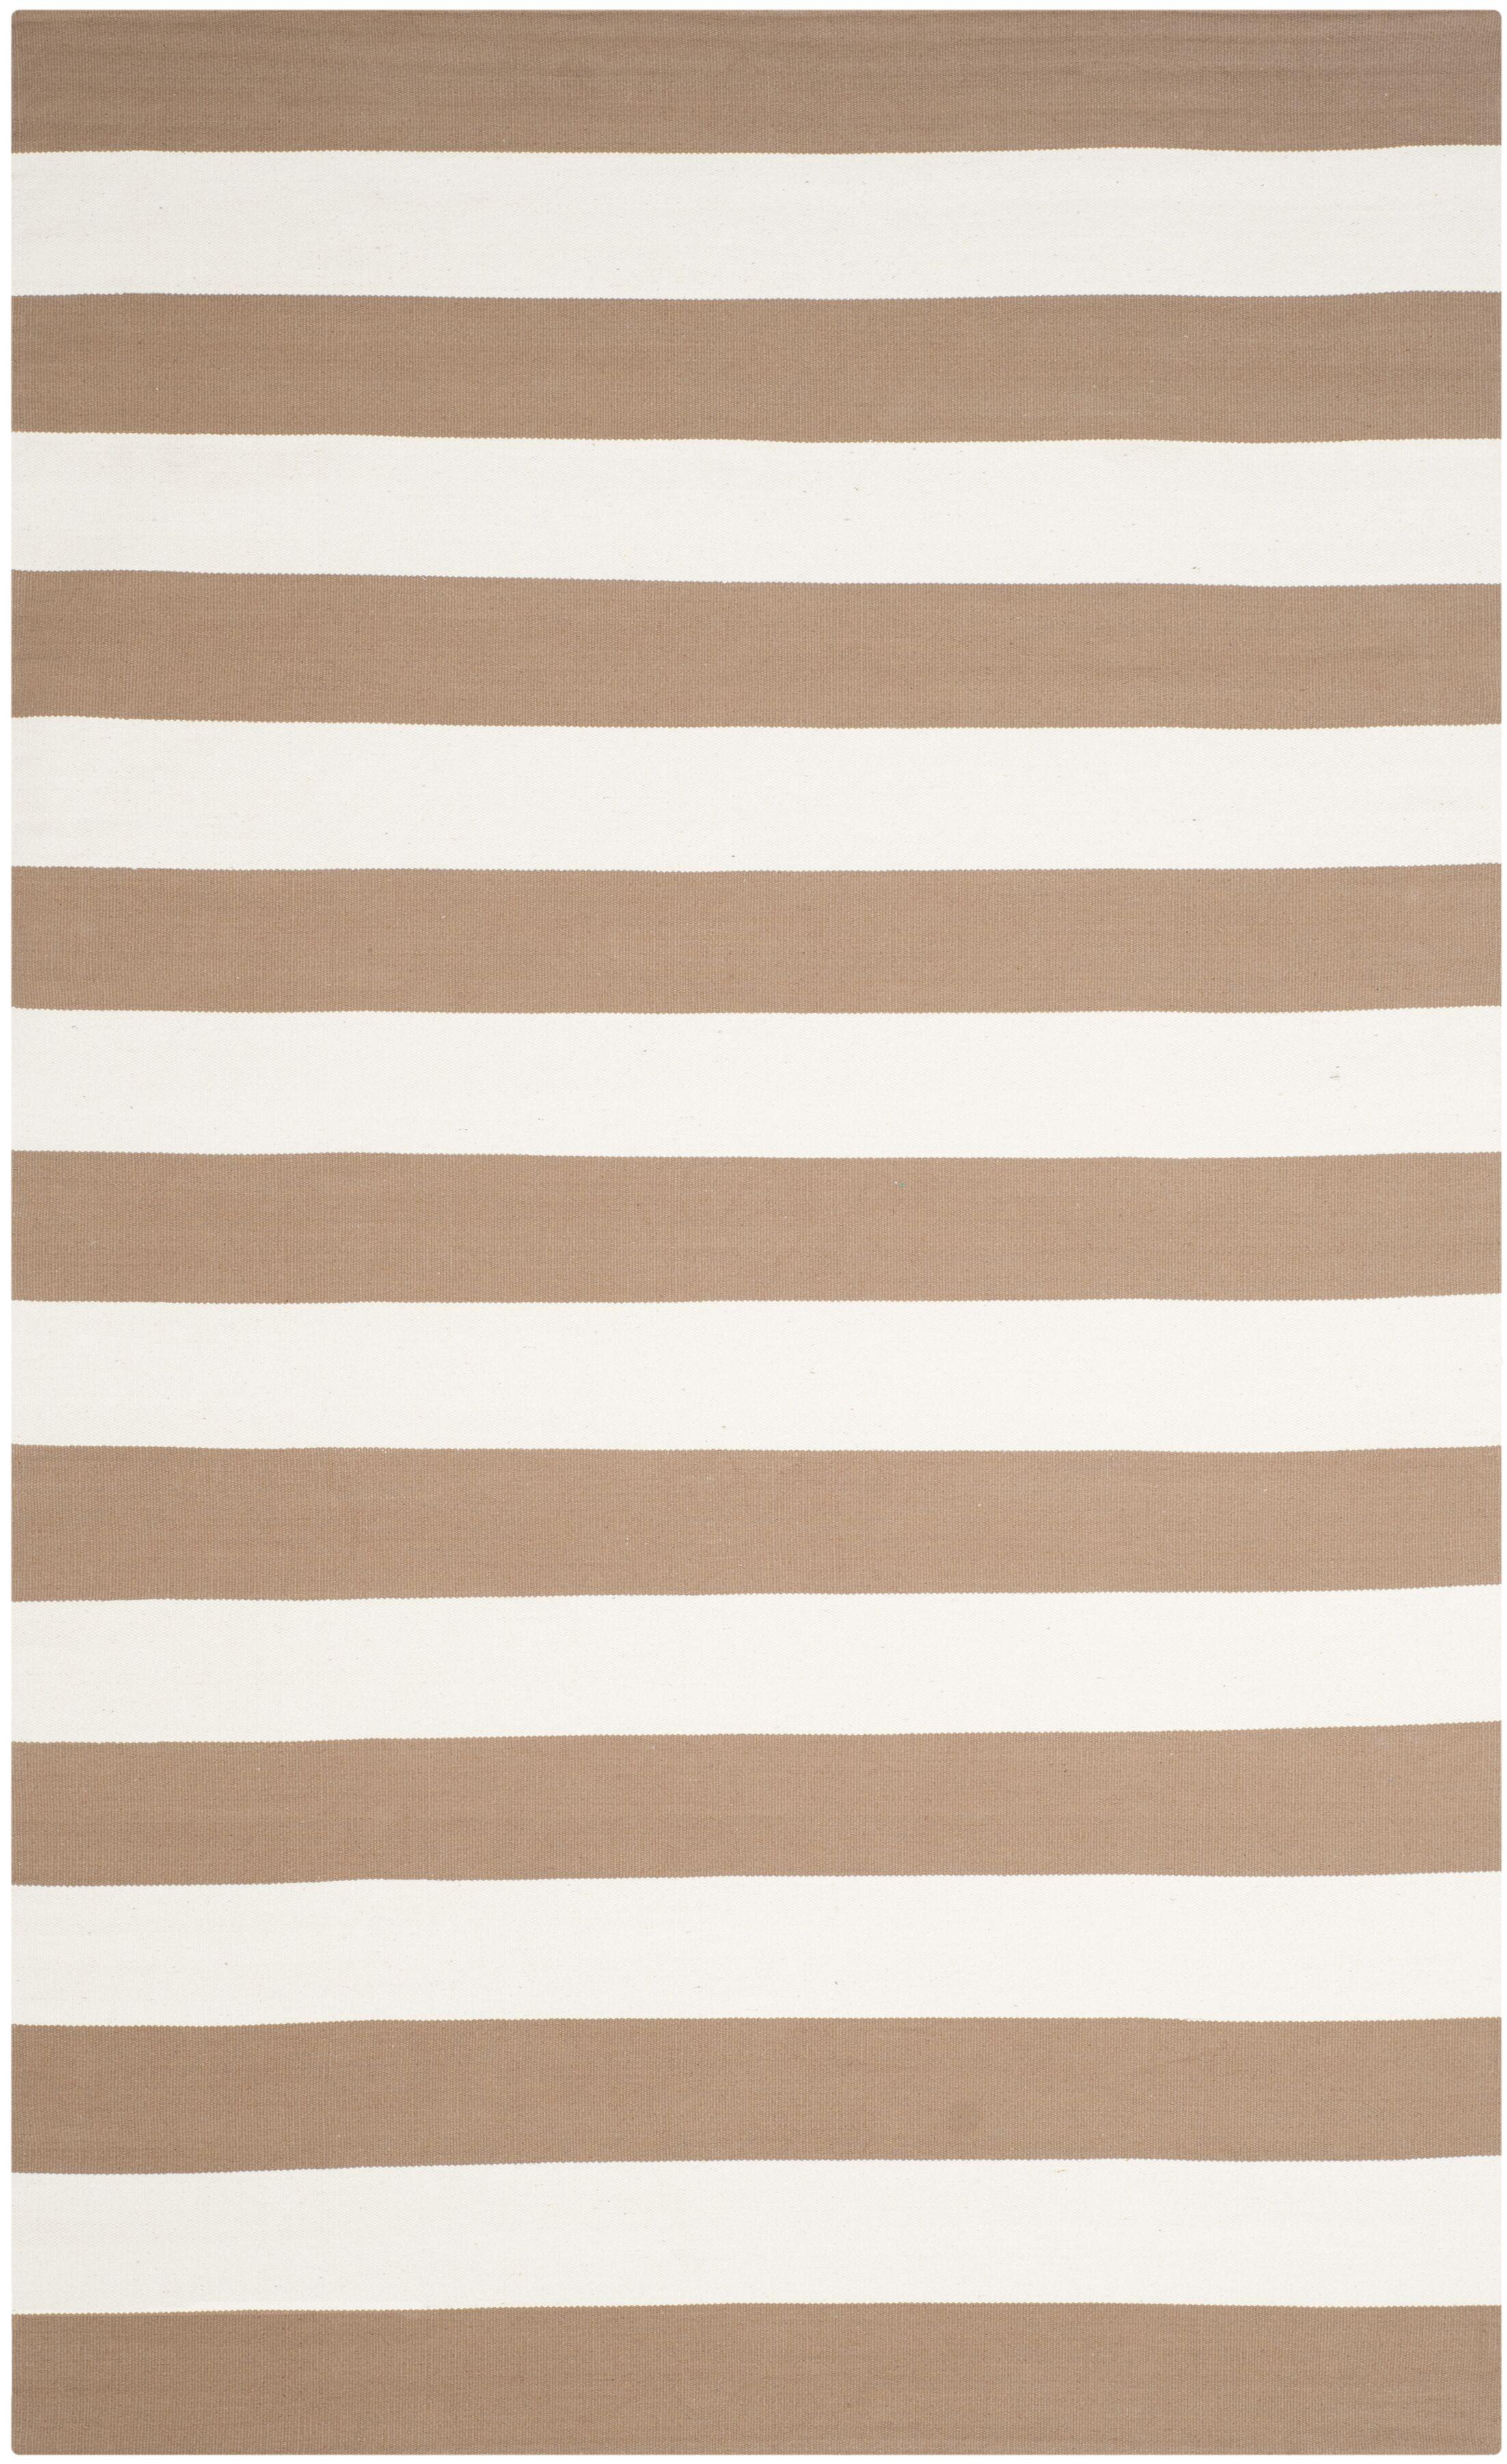 Sky Hand-Woven Sand/Ivory Area Rug Rug Size: Rectangle 9' x 12'